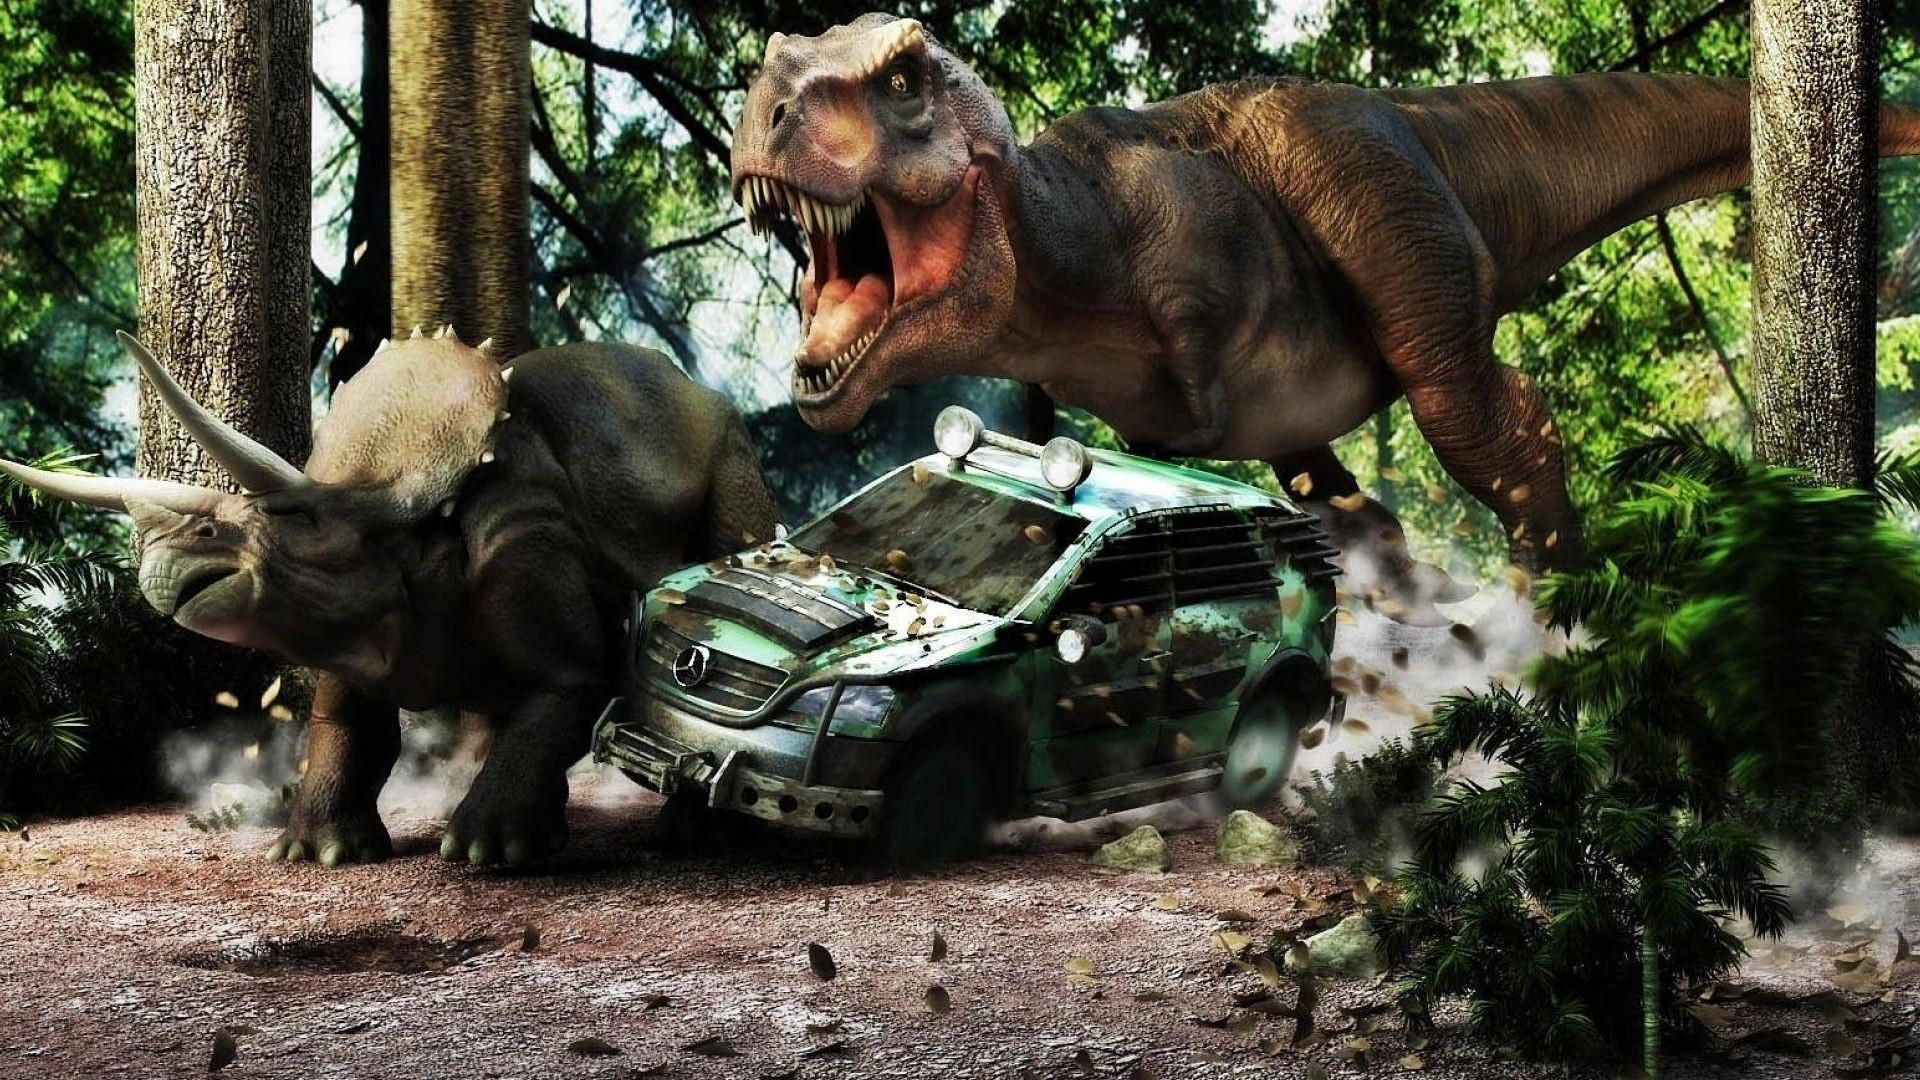 Jurassic World PC Wallpaper